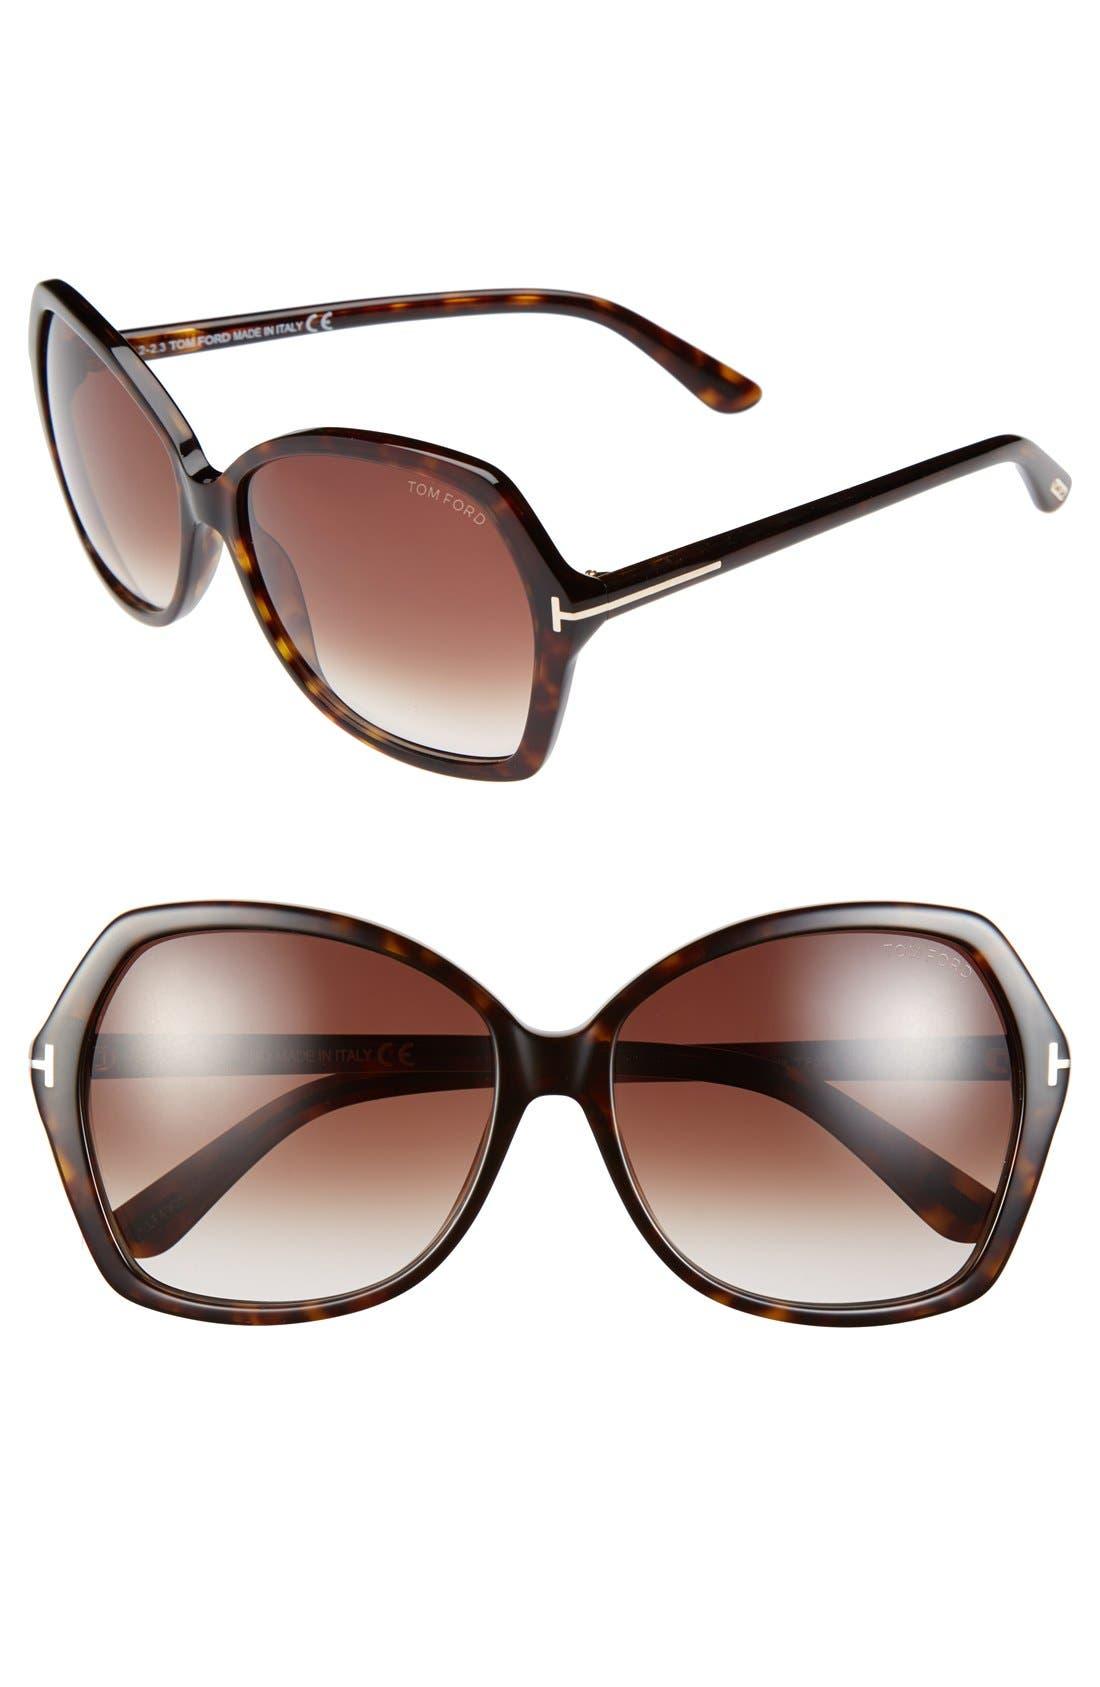 Main Image - Tom Ford Carola 60mm Sunglasses